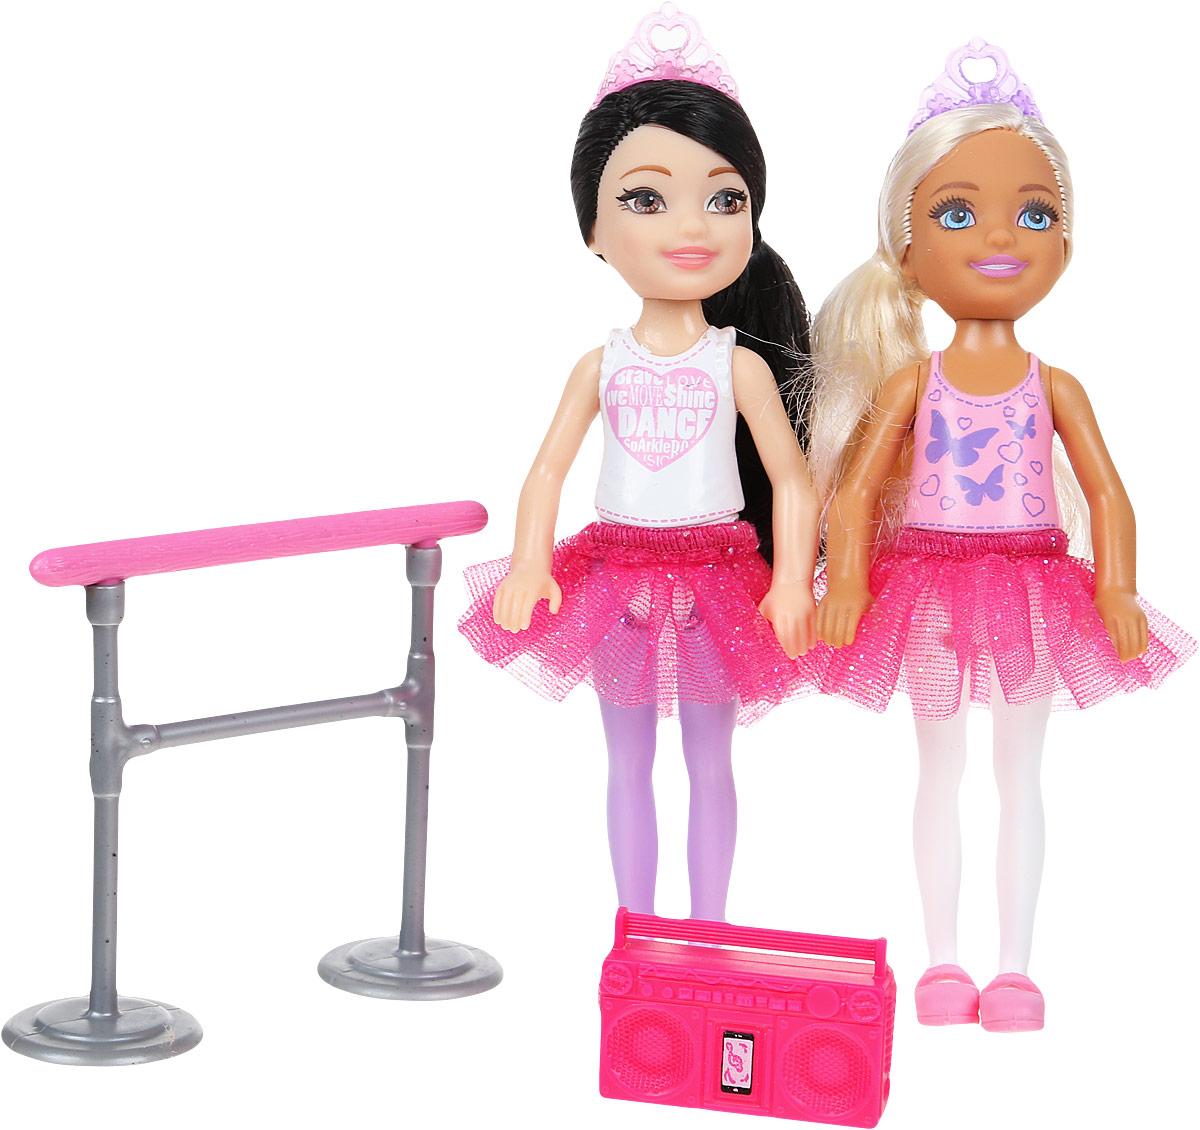 Barbie Кукла Челси 2 шт FHK96_FHK98 аксессуары для микрофонов радио и конференц систем invotone mpf100